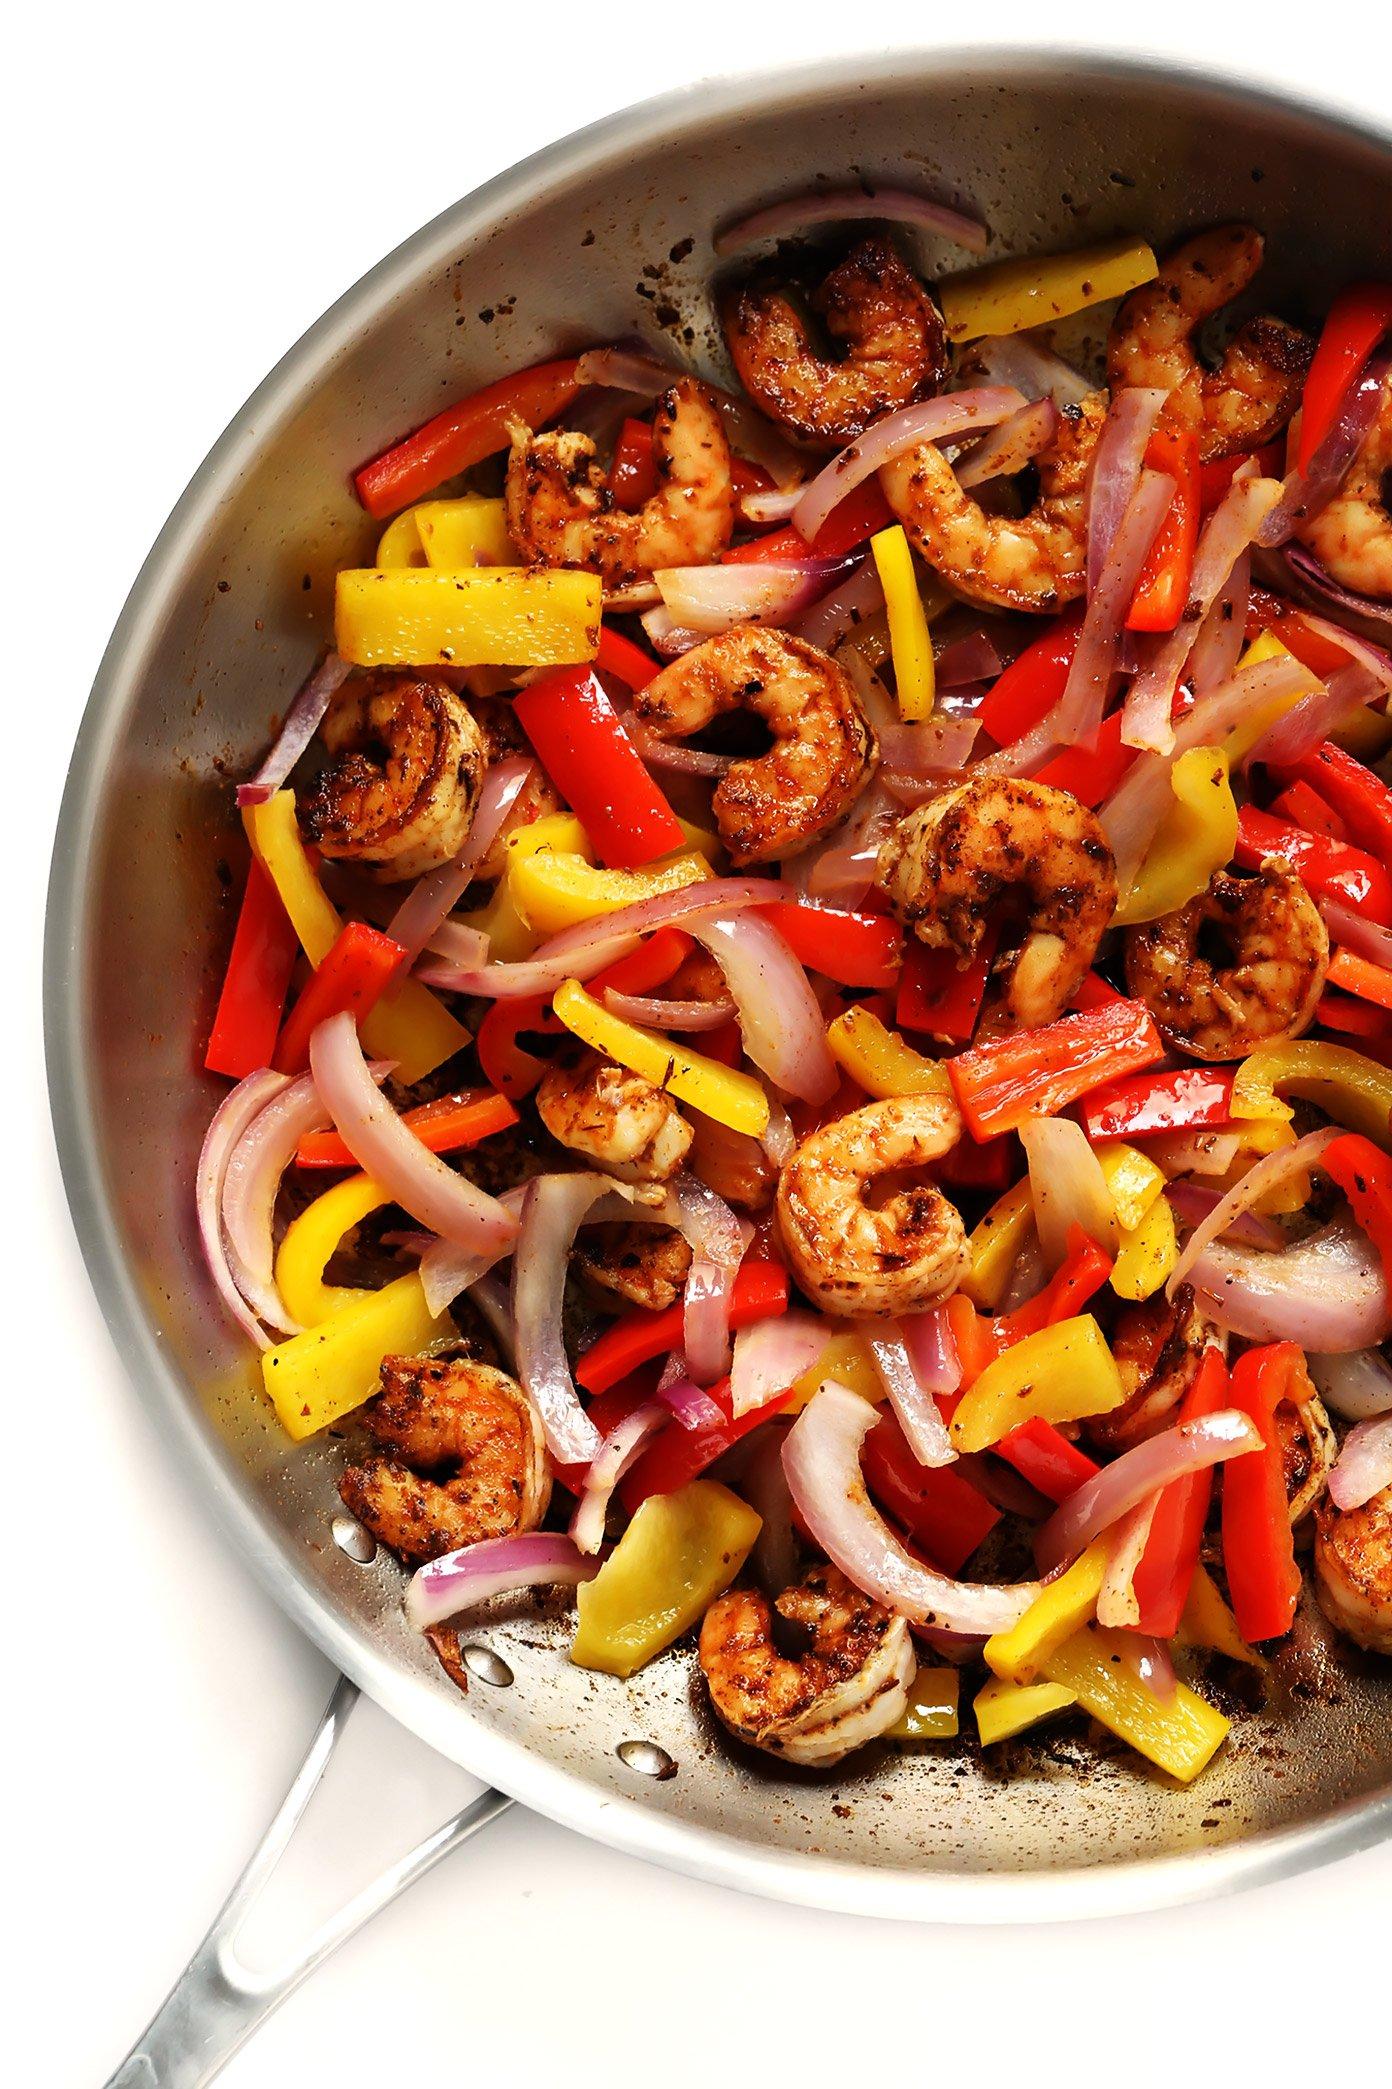 Cajun Shrimp, Bell Peppers and Red Onion | Cajun Shrimp Pasta Recipe